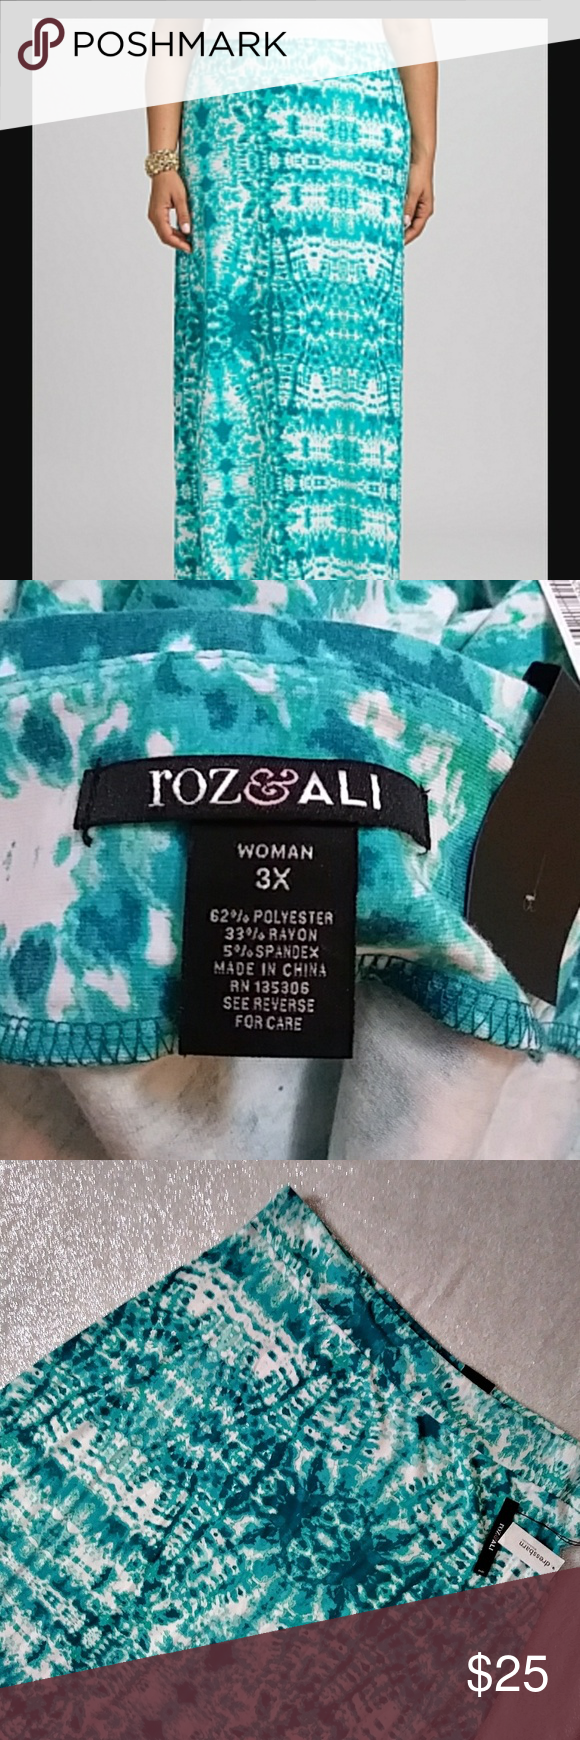 NWT Roz Ali Turquoise Tye Die Maxi Skirt Size 3x